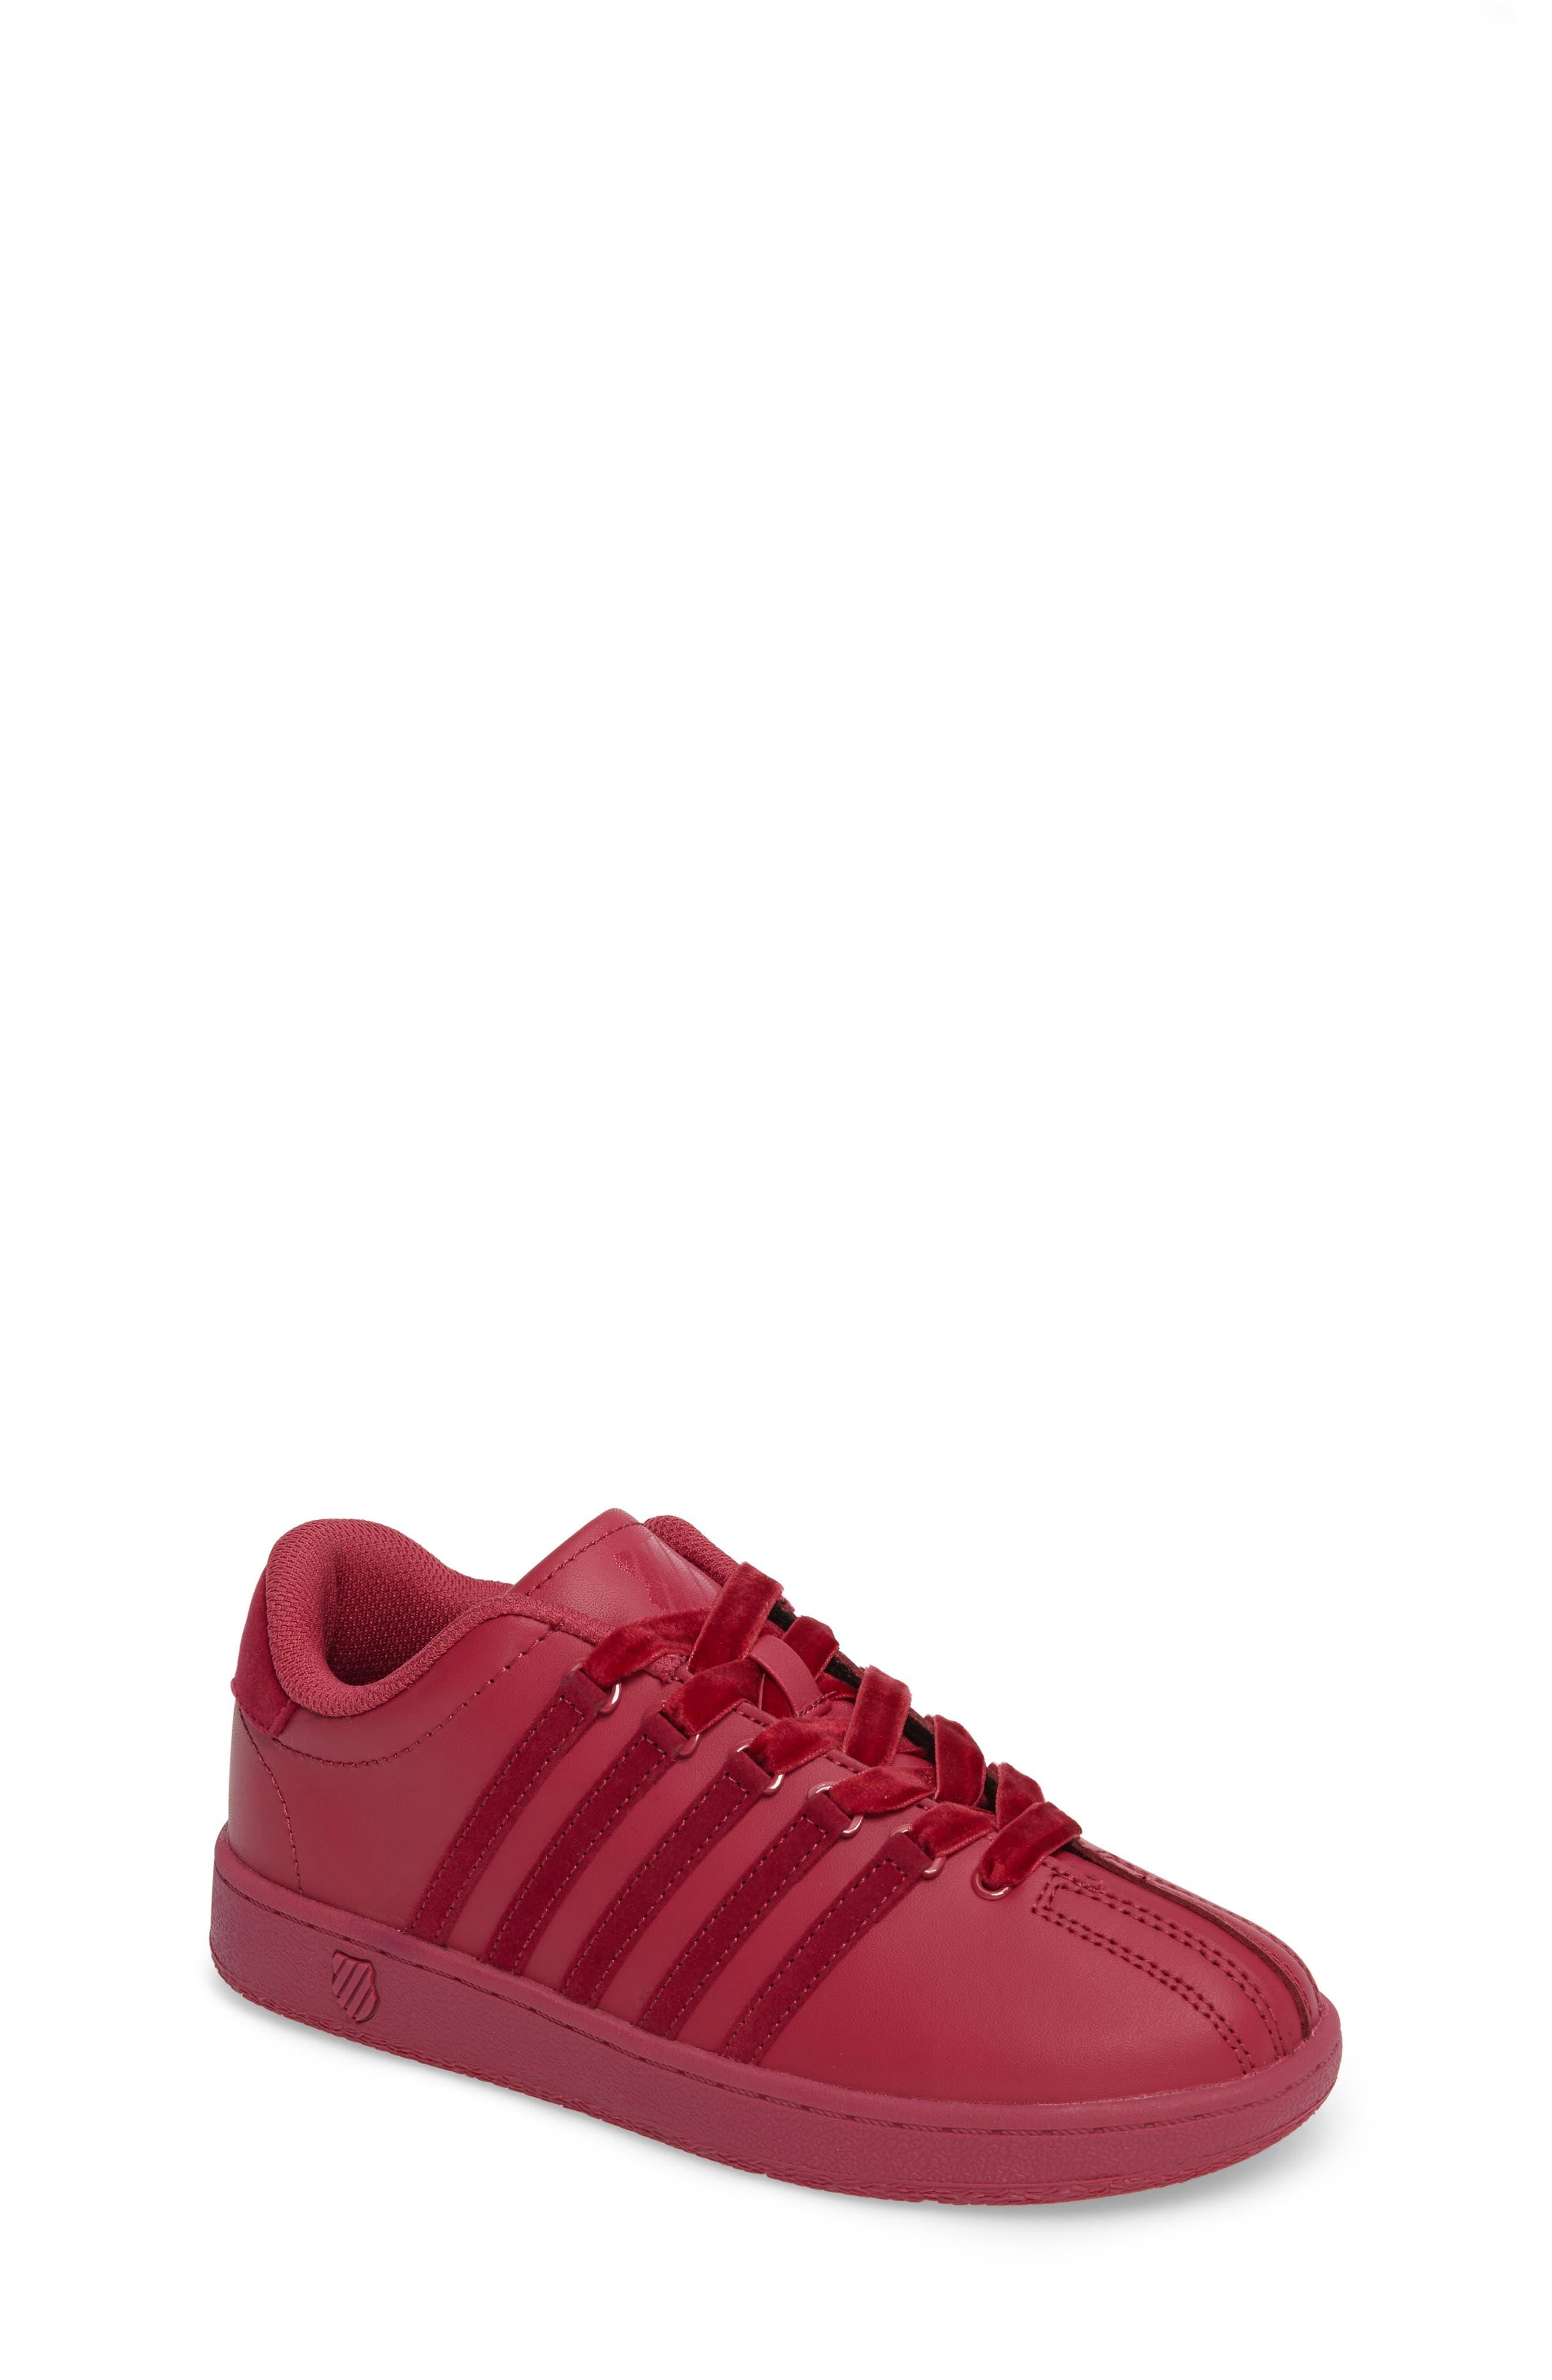 Alternate Image 1 Selected - K-Swiss Classic VN Sneaker (Big Kid)